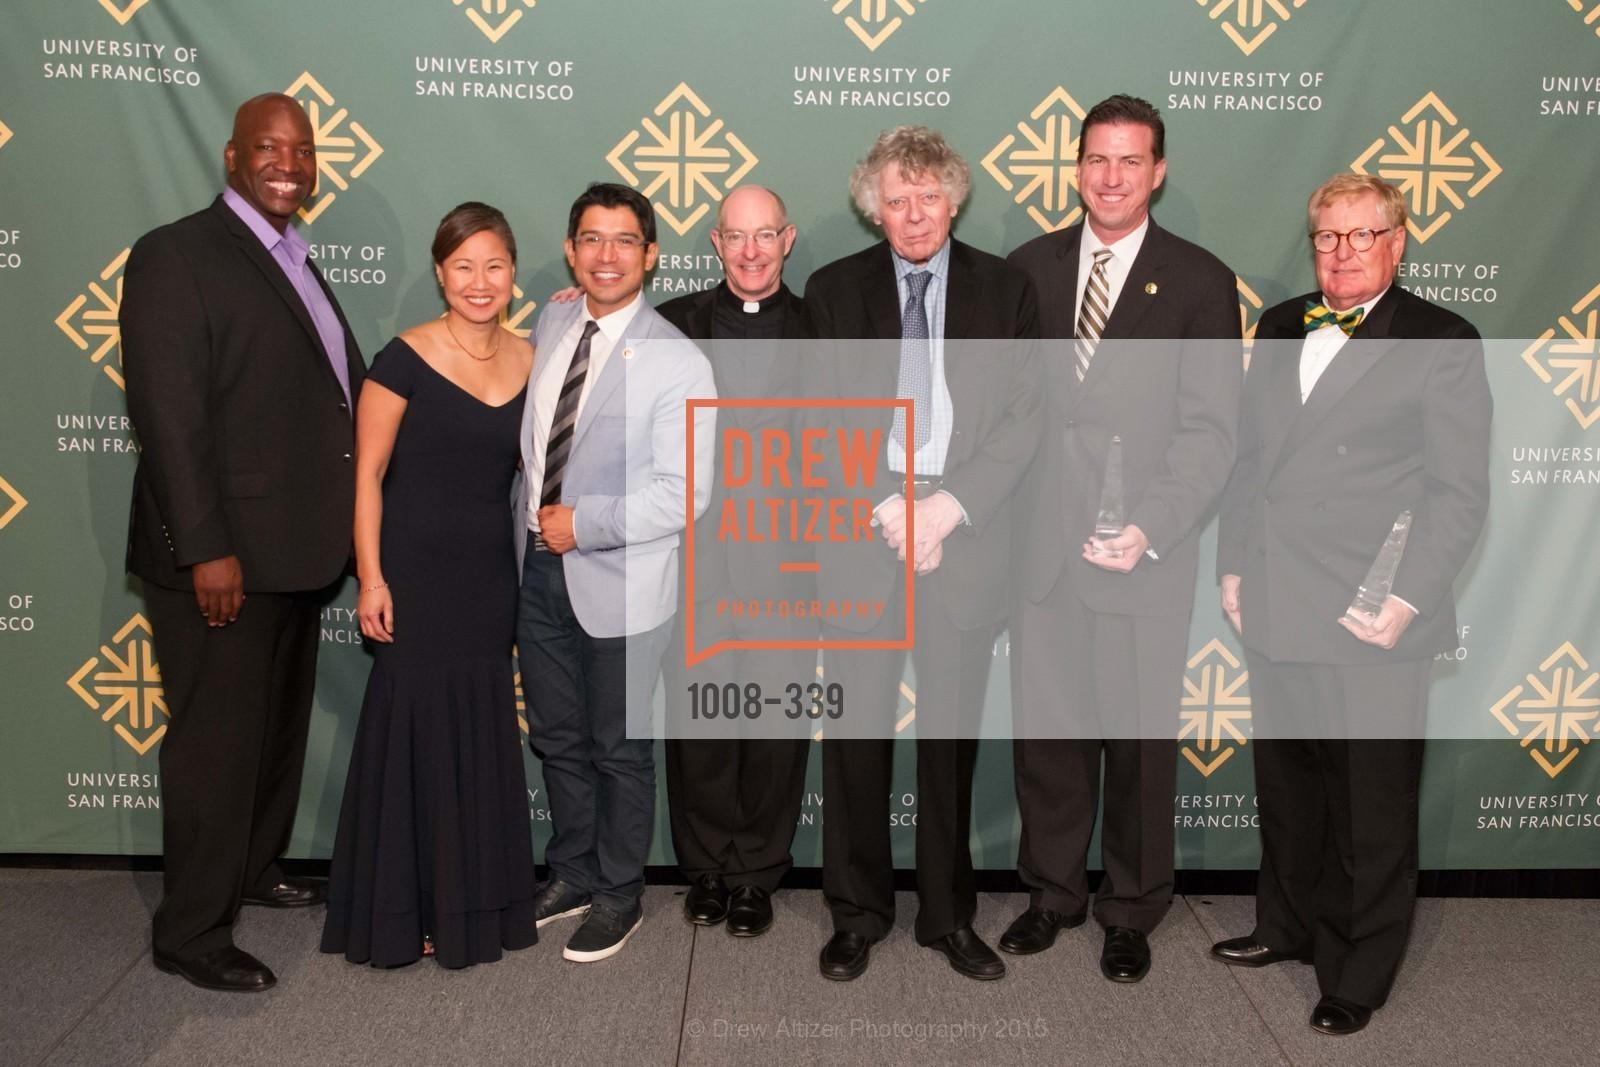 Aaron Horn, Doris Cheng, Carlos Menchaca, Paul Fitzgerald, Gordon Getty, Kevin Mullin, William Hollingsworth, Photo #1008-339